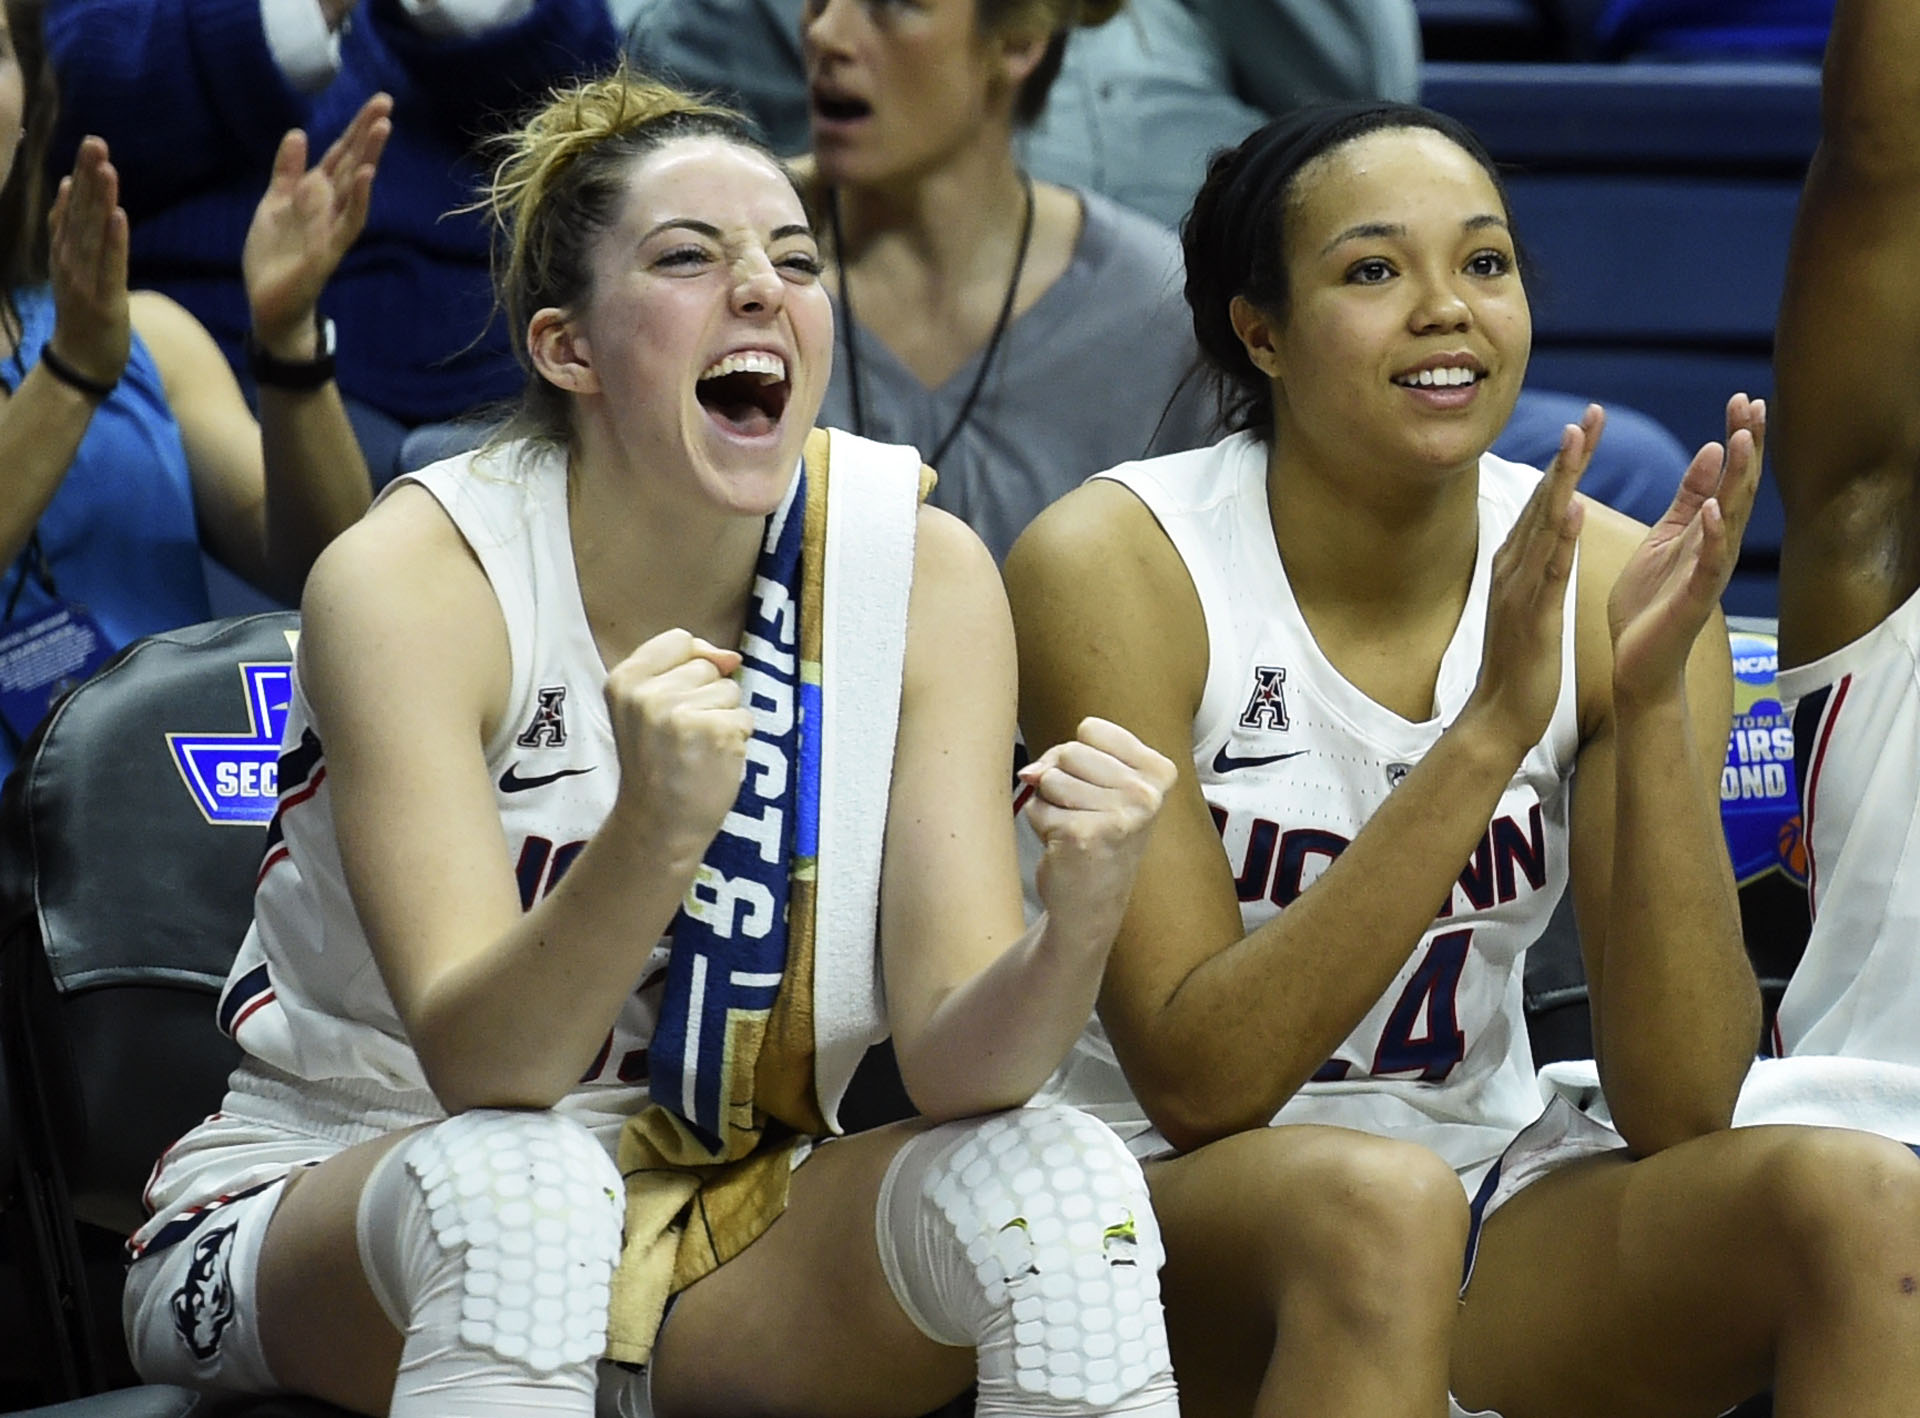 NCAA Towson UConn Basketball Samuelson Collier